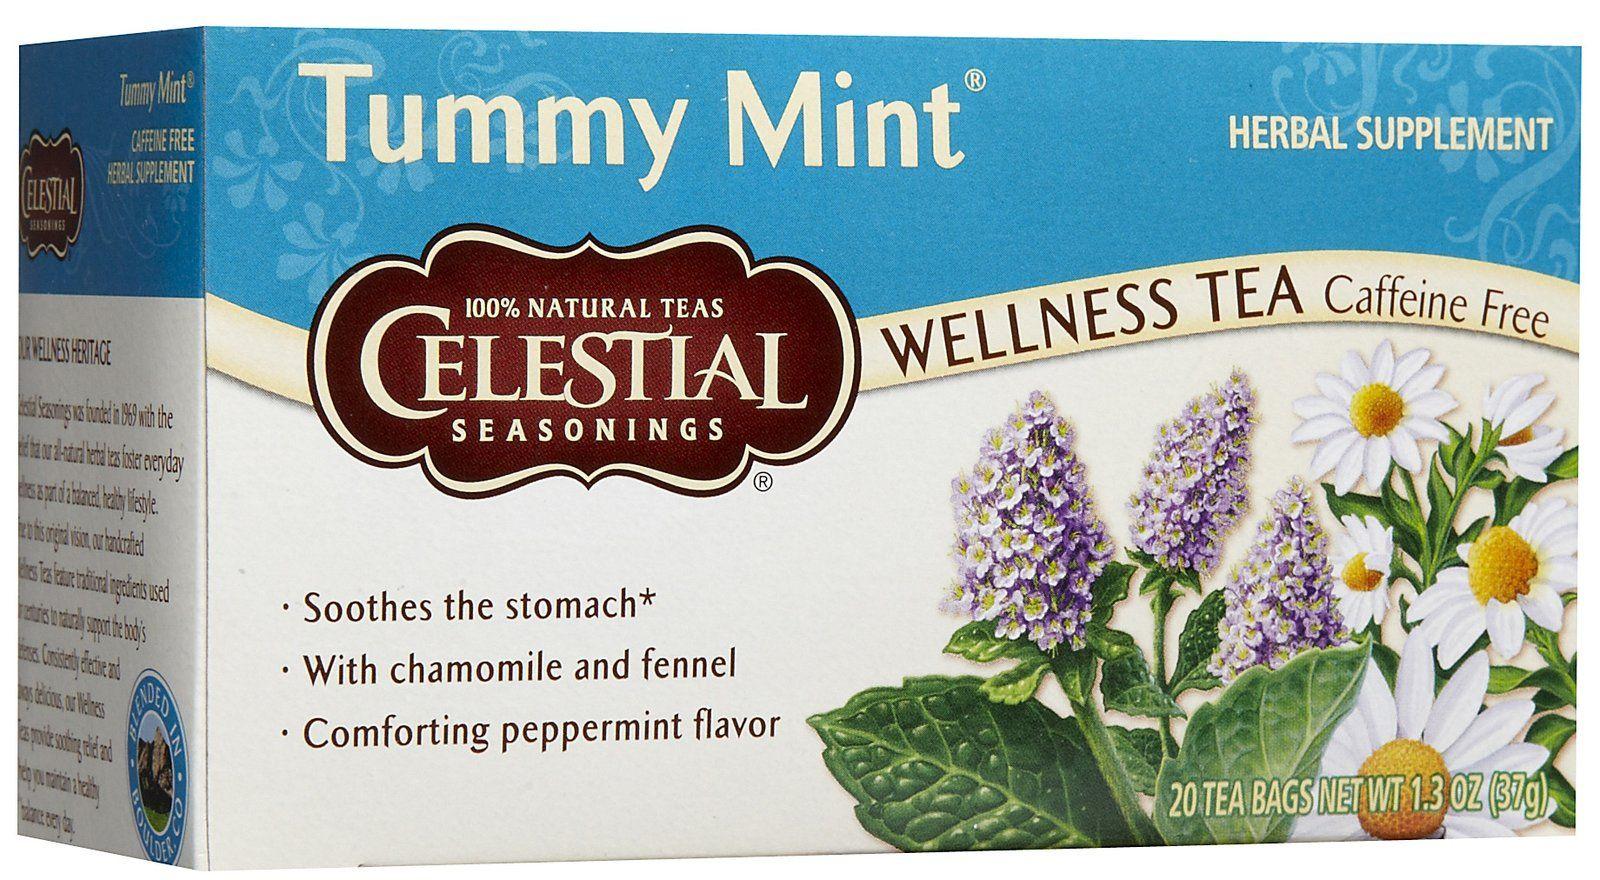 Celestial Seasonings Tummy Mint Tea Bags 20 ct Free Shipping